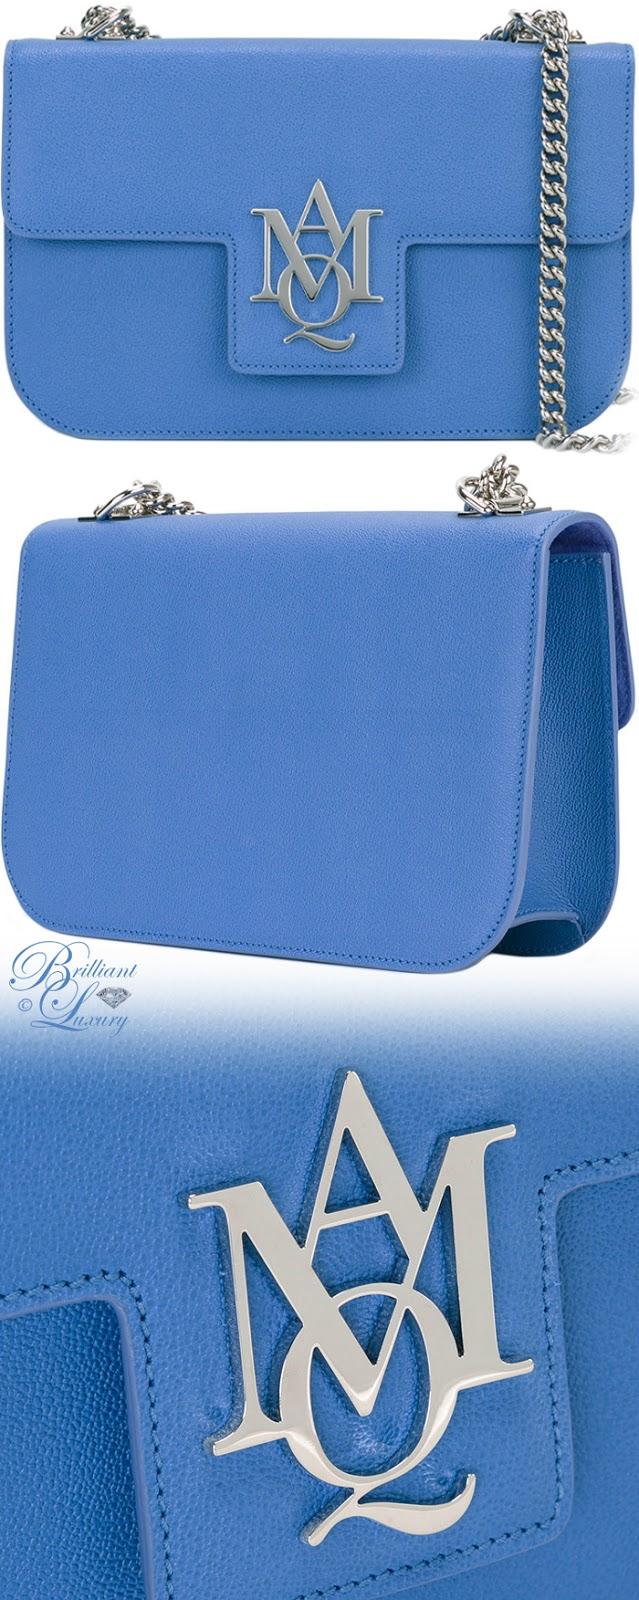 Brilliant Luxury ♦ Alexander McQueen Insignia Satchel